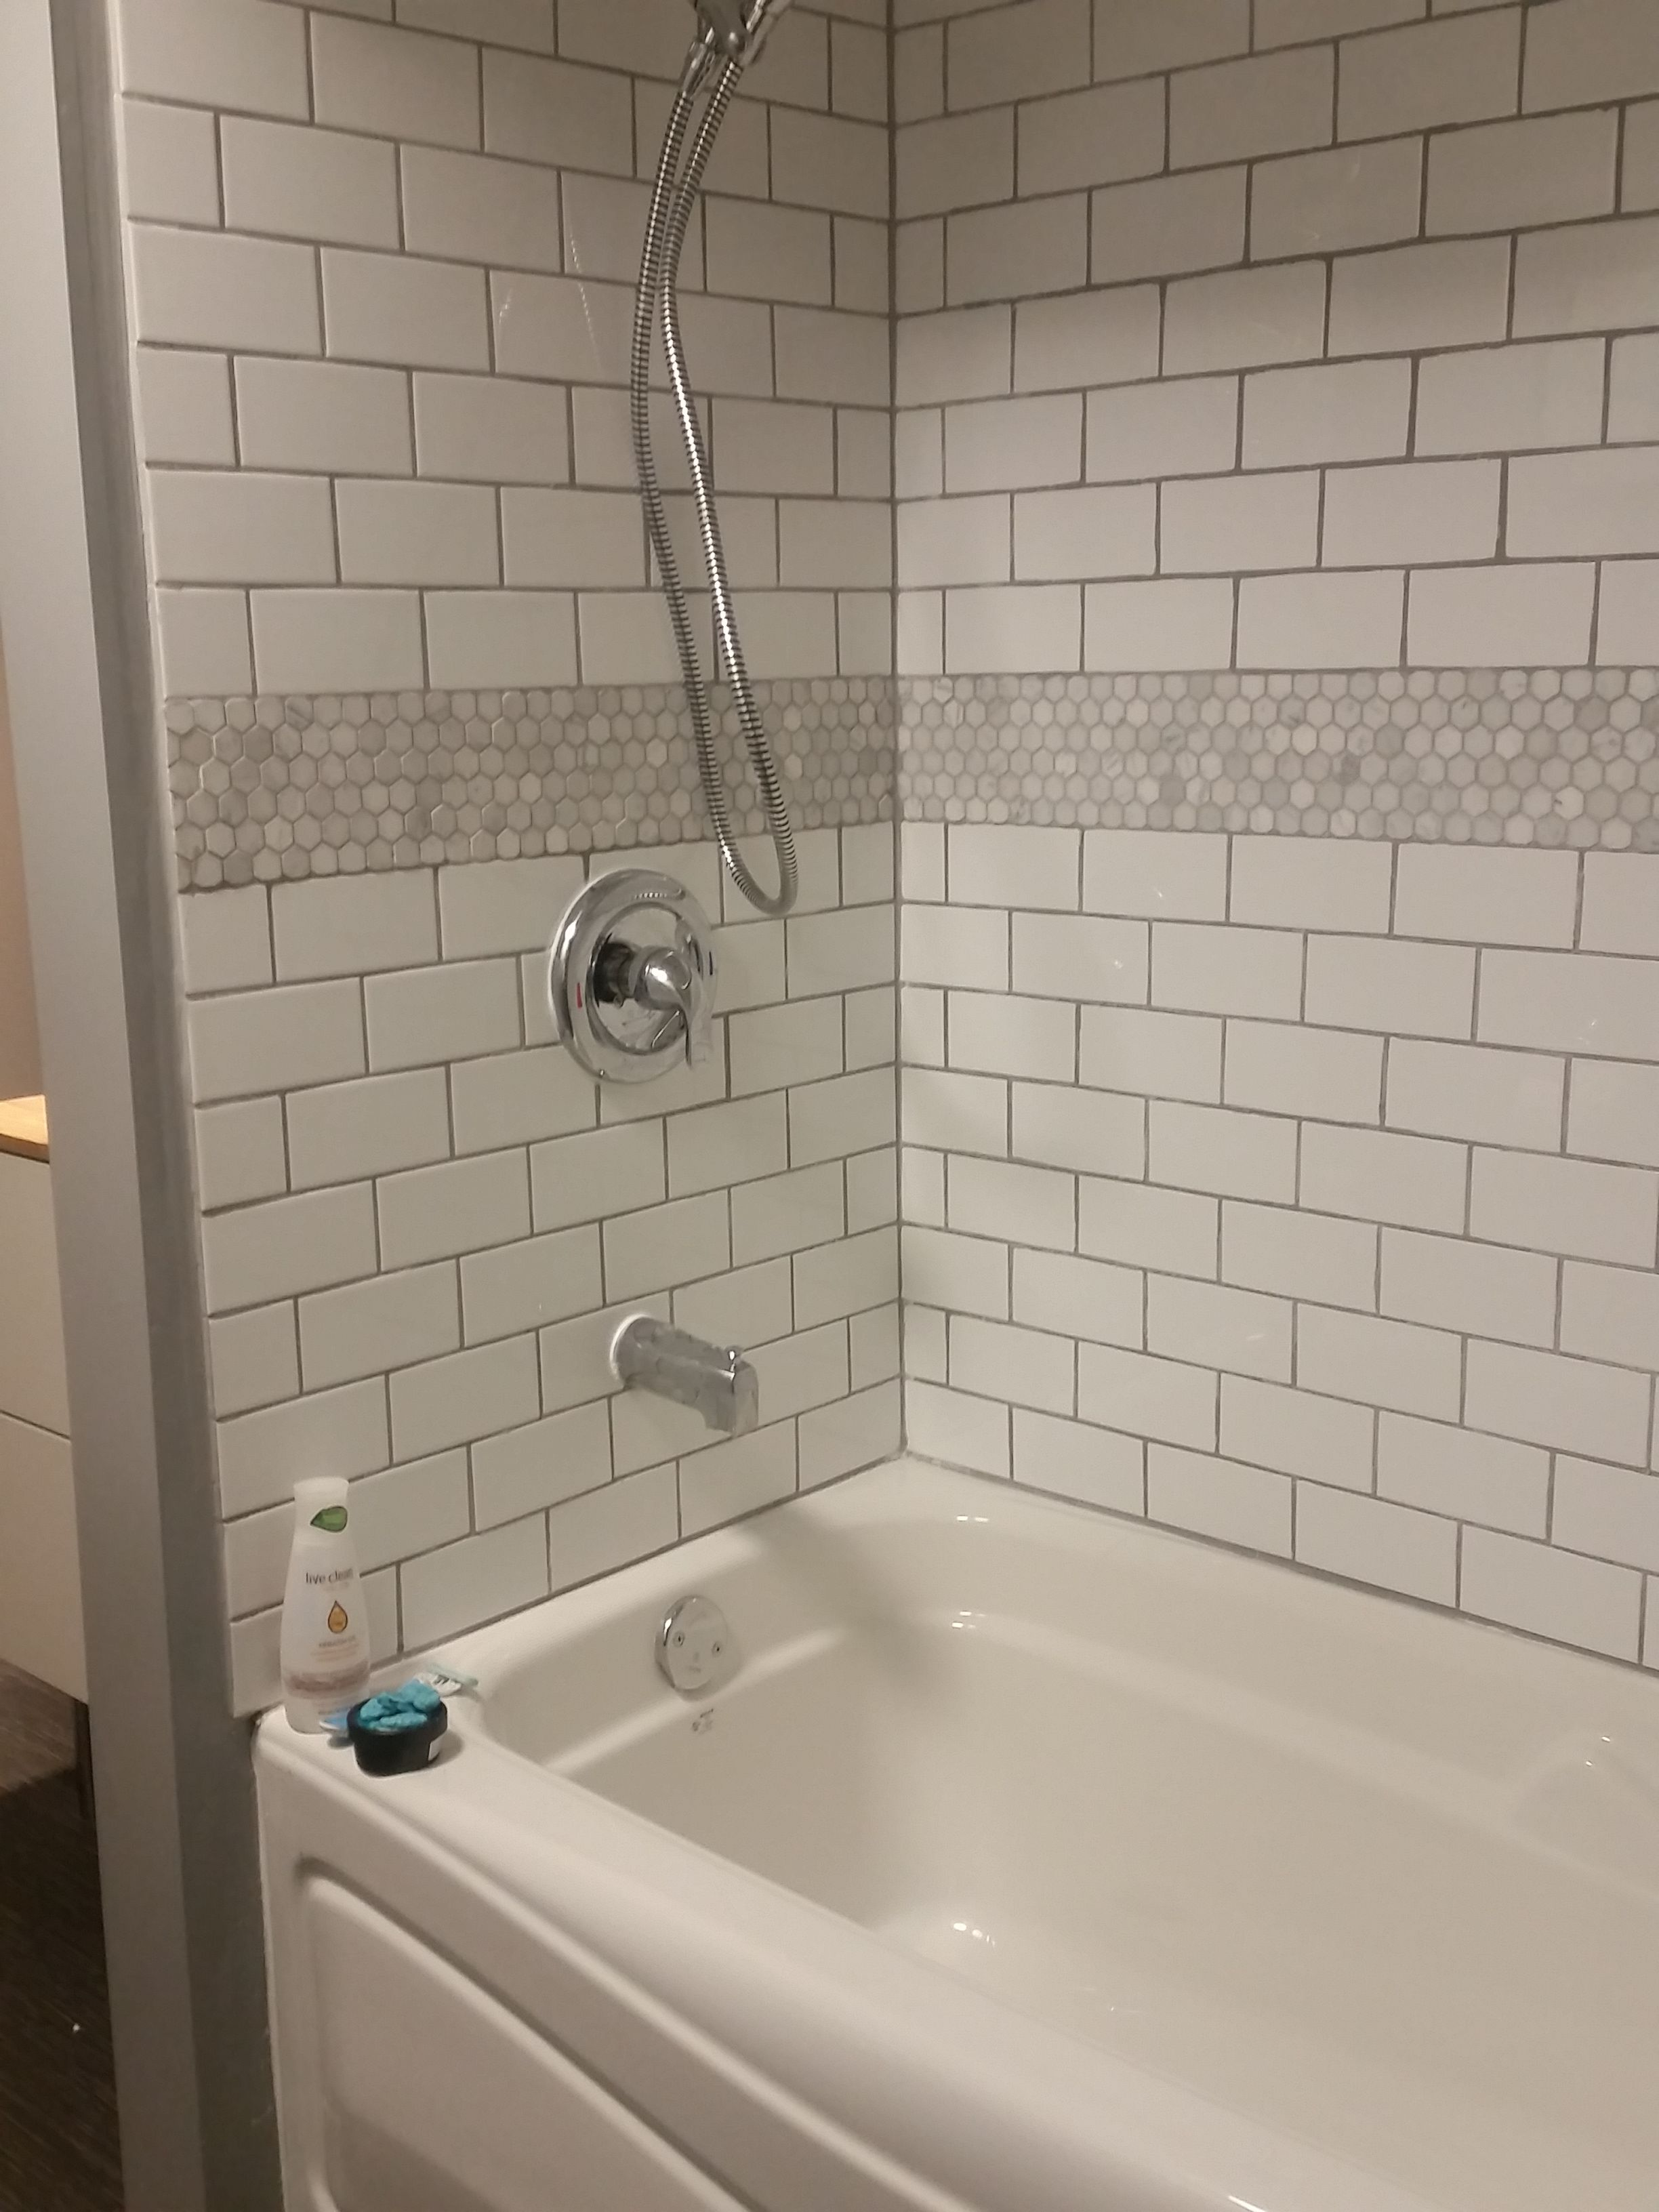 Subway Tile Bathtub | Tile Design Ideas